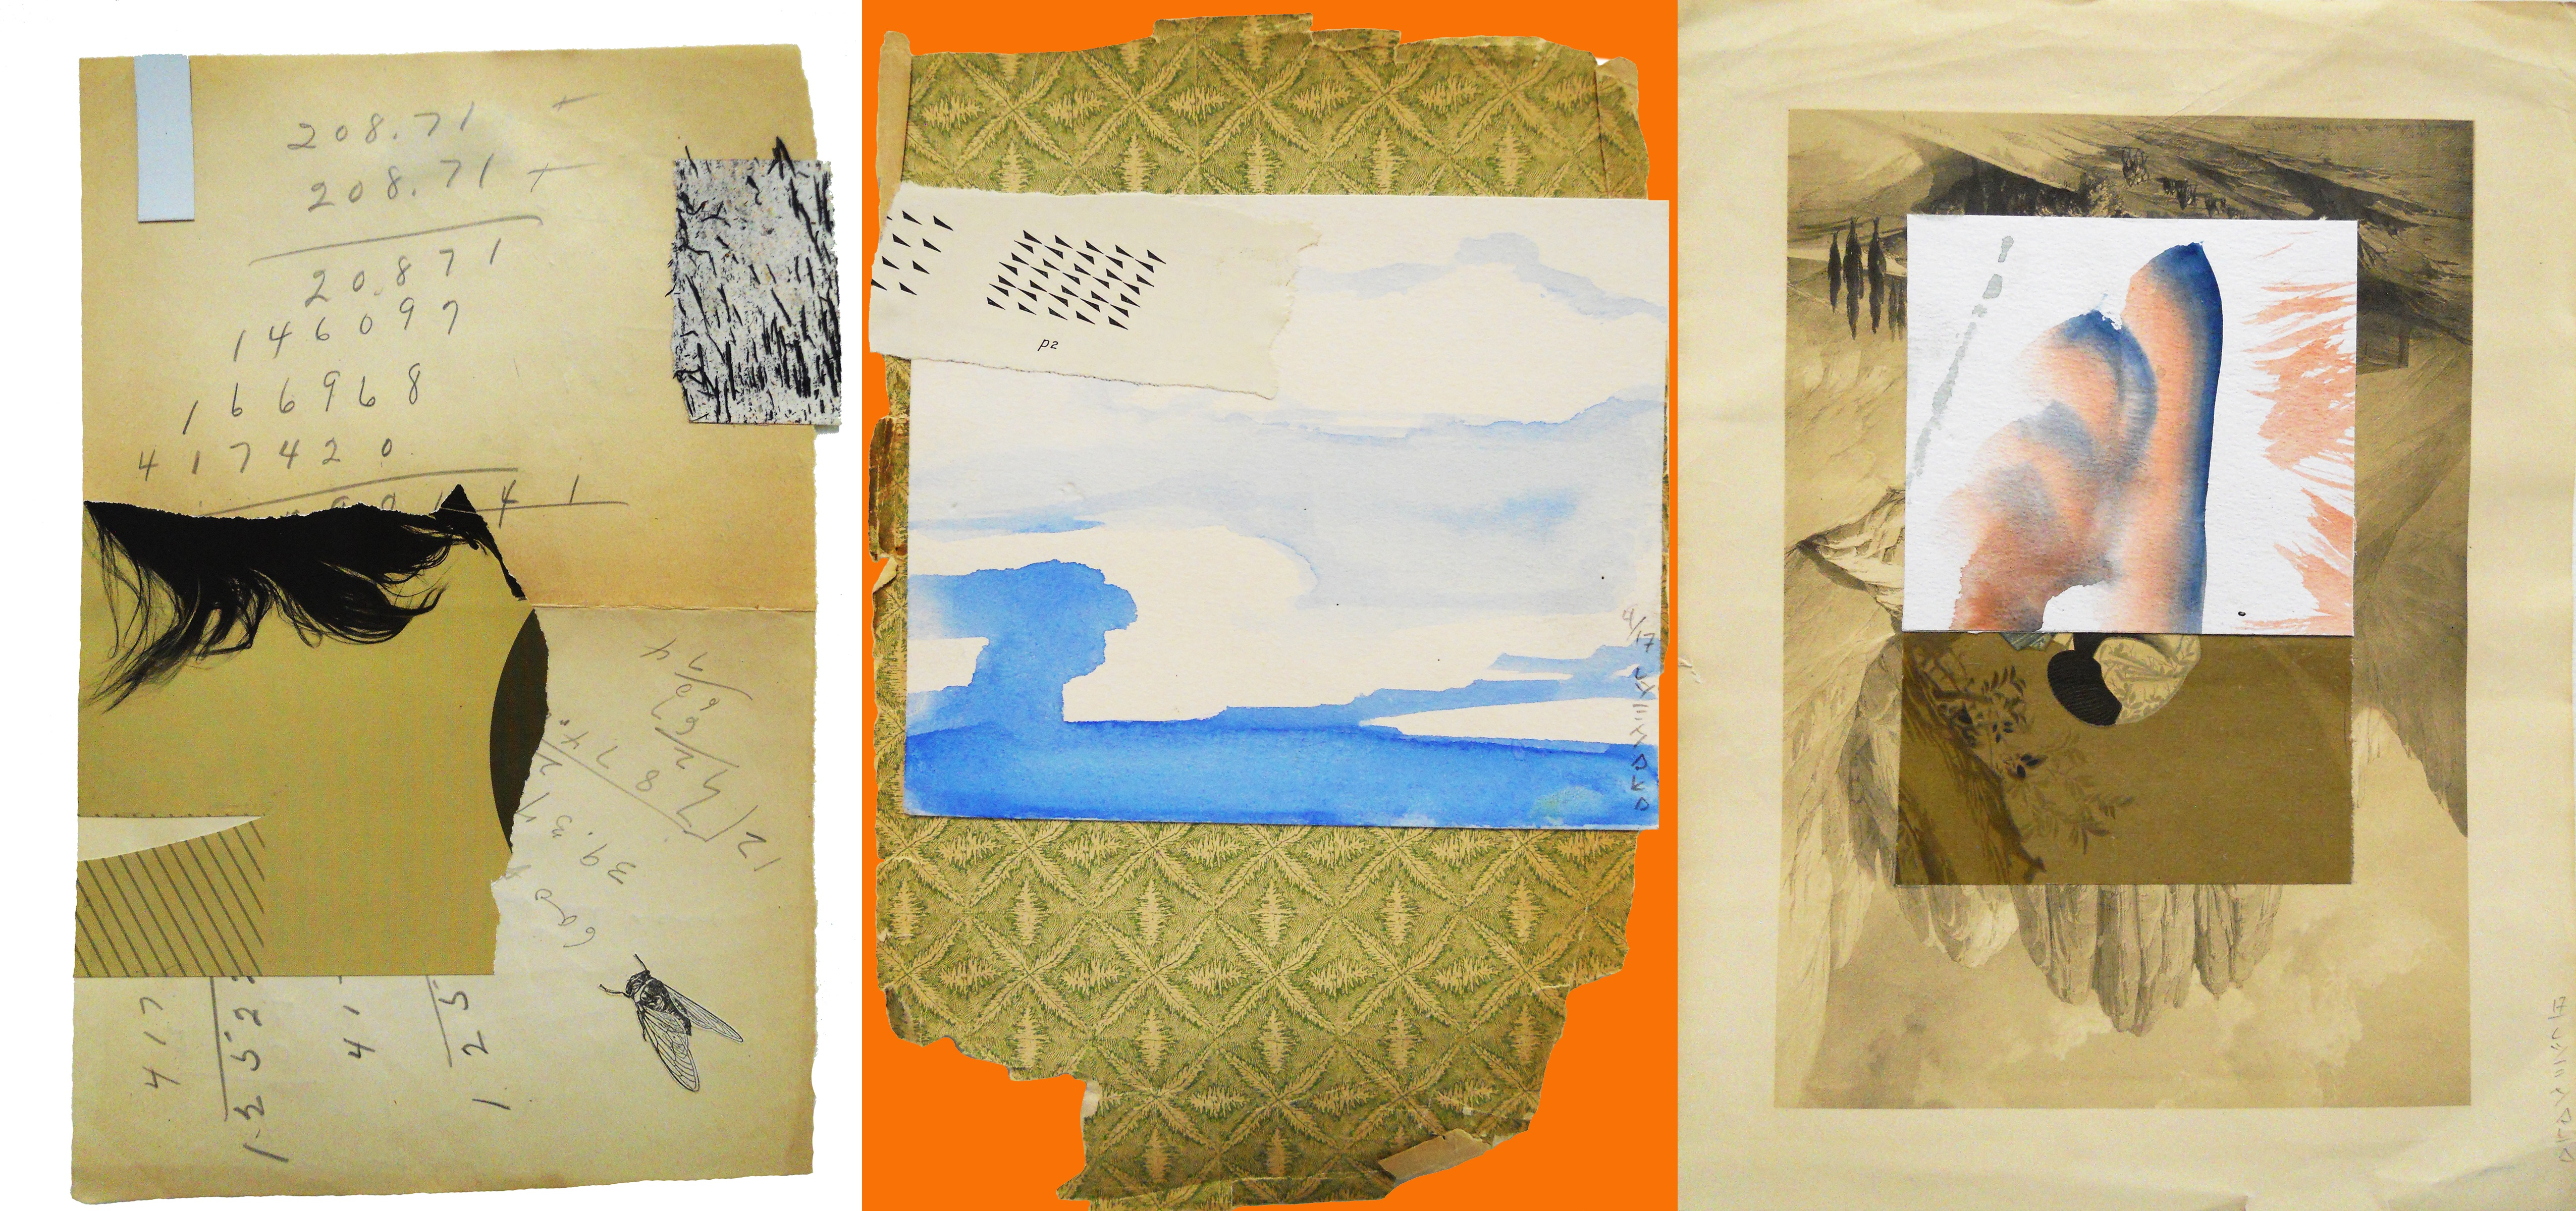 Previous Exhibitions | Architectural Foundation of Santa Barbara